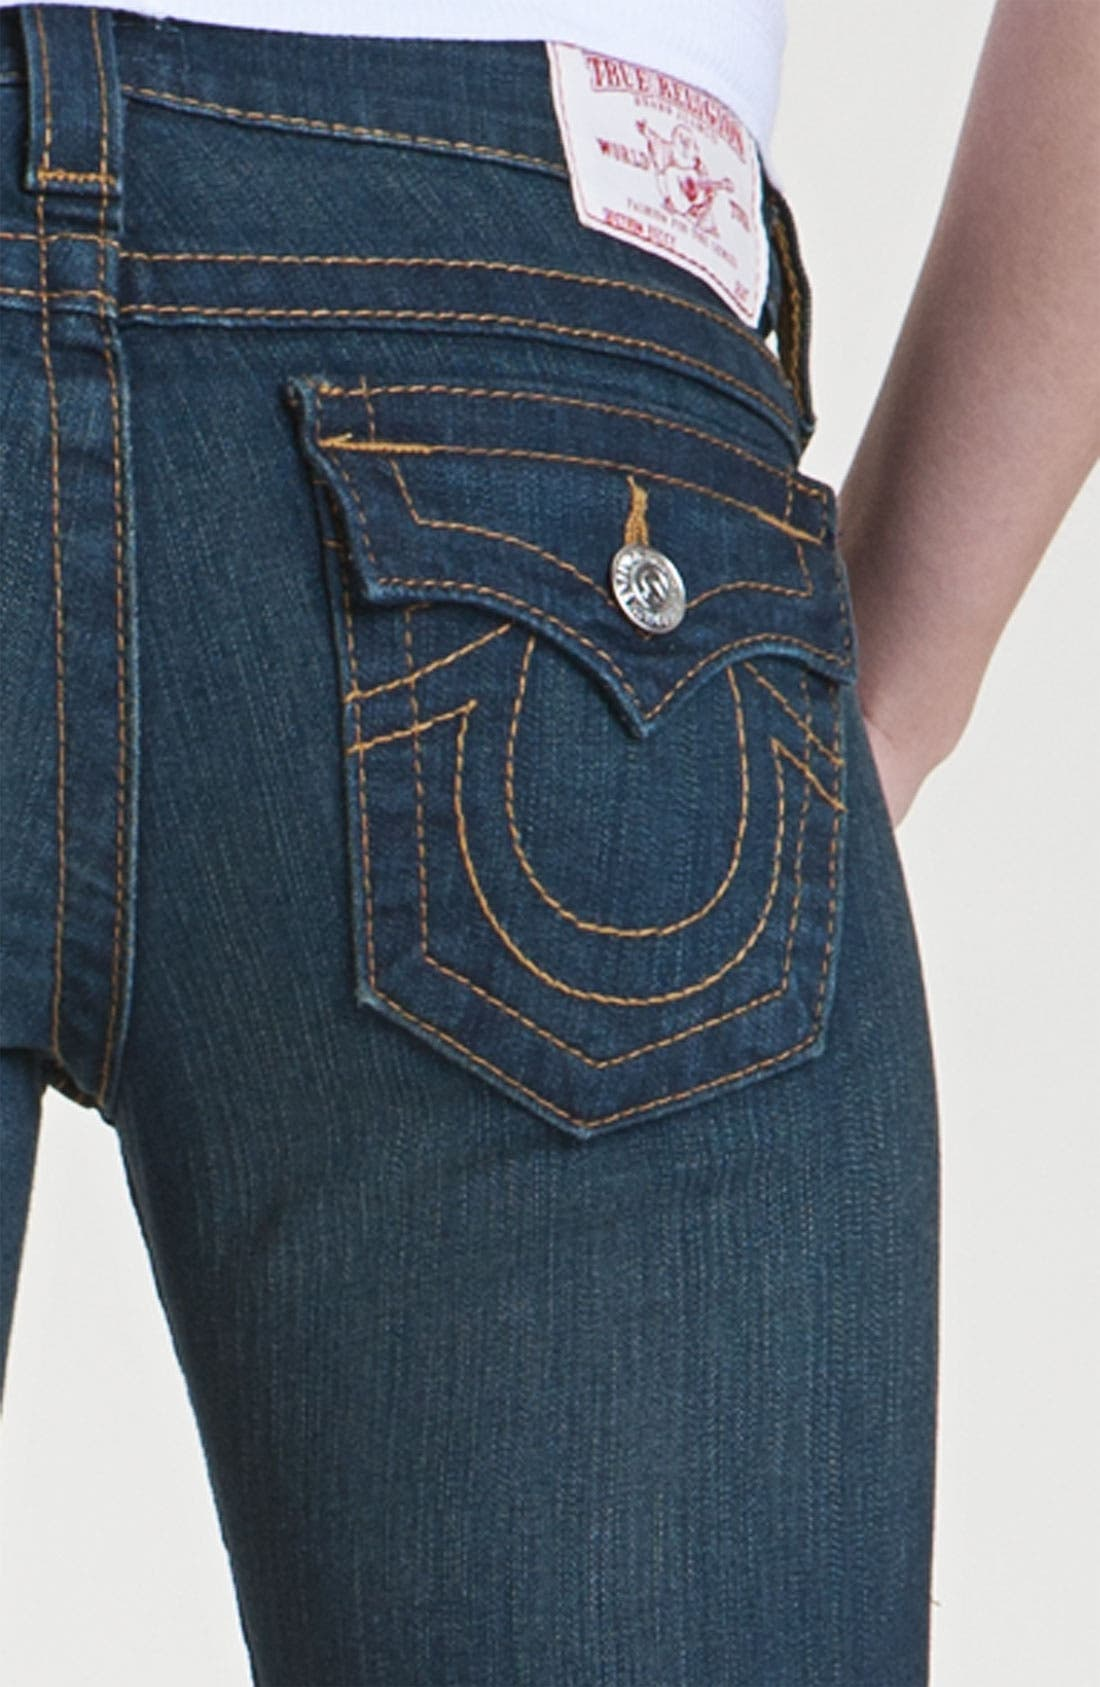 Alternate Image 3  - True Religion Brand Jeans 'Becky' Bootcut Jeans (Vera Cruz) (Petite)